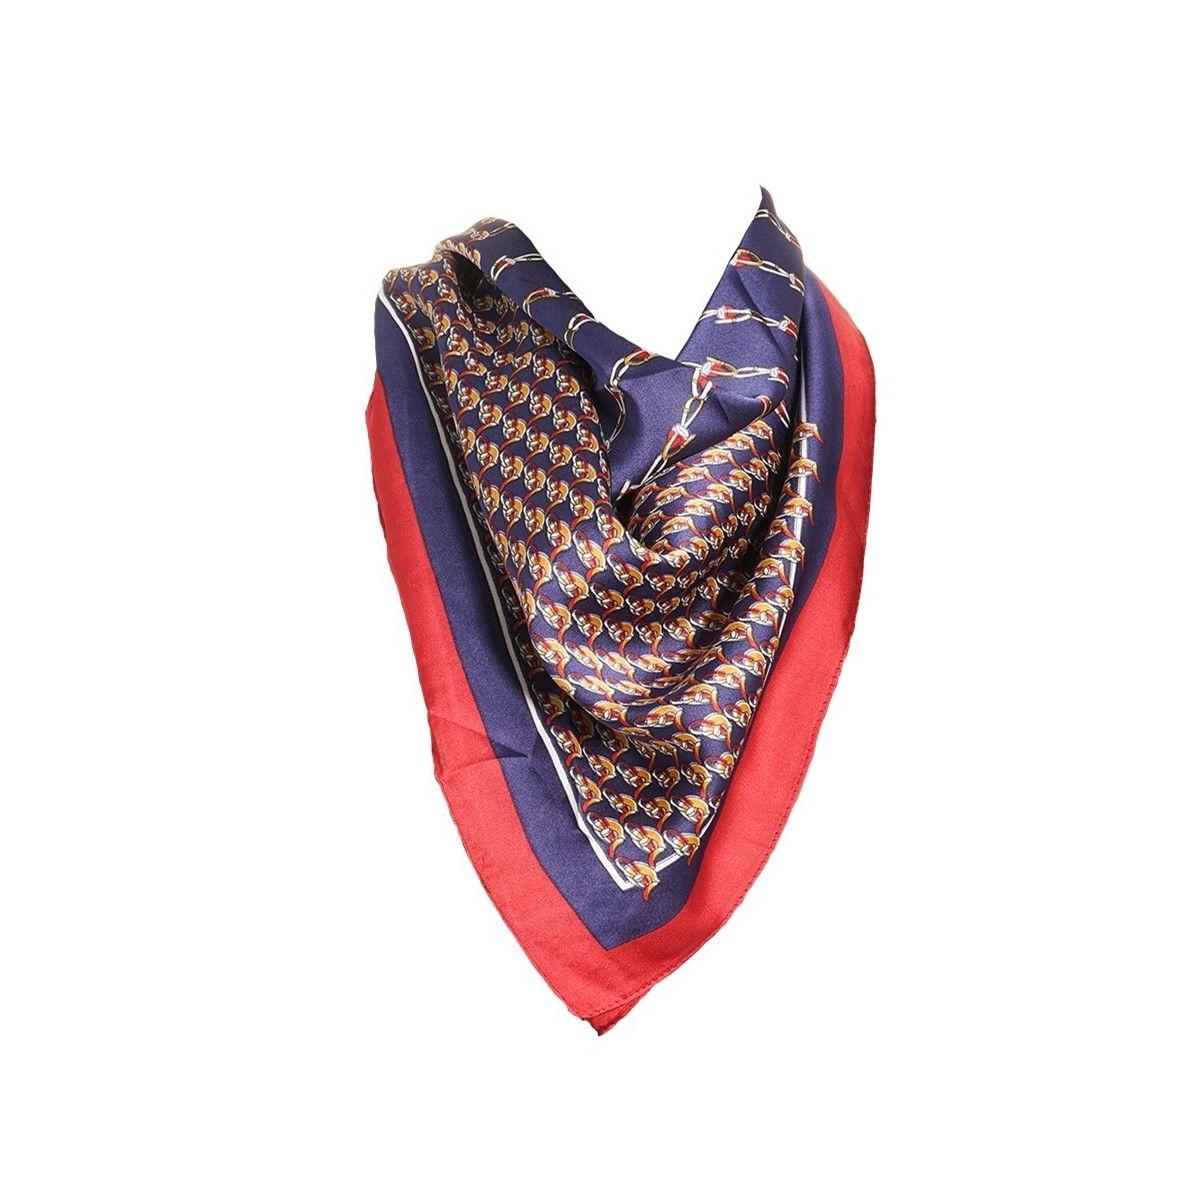 Foulard motif Bleu avec sa pochette cadeau